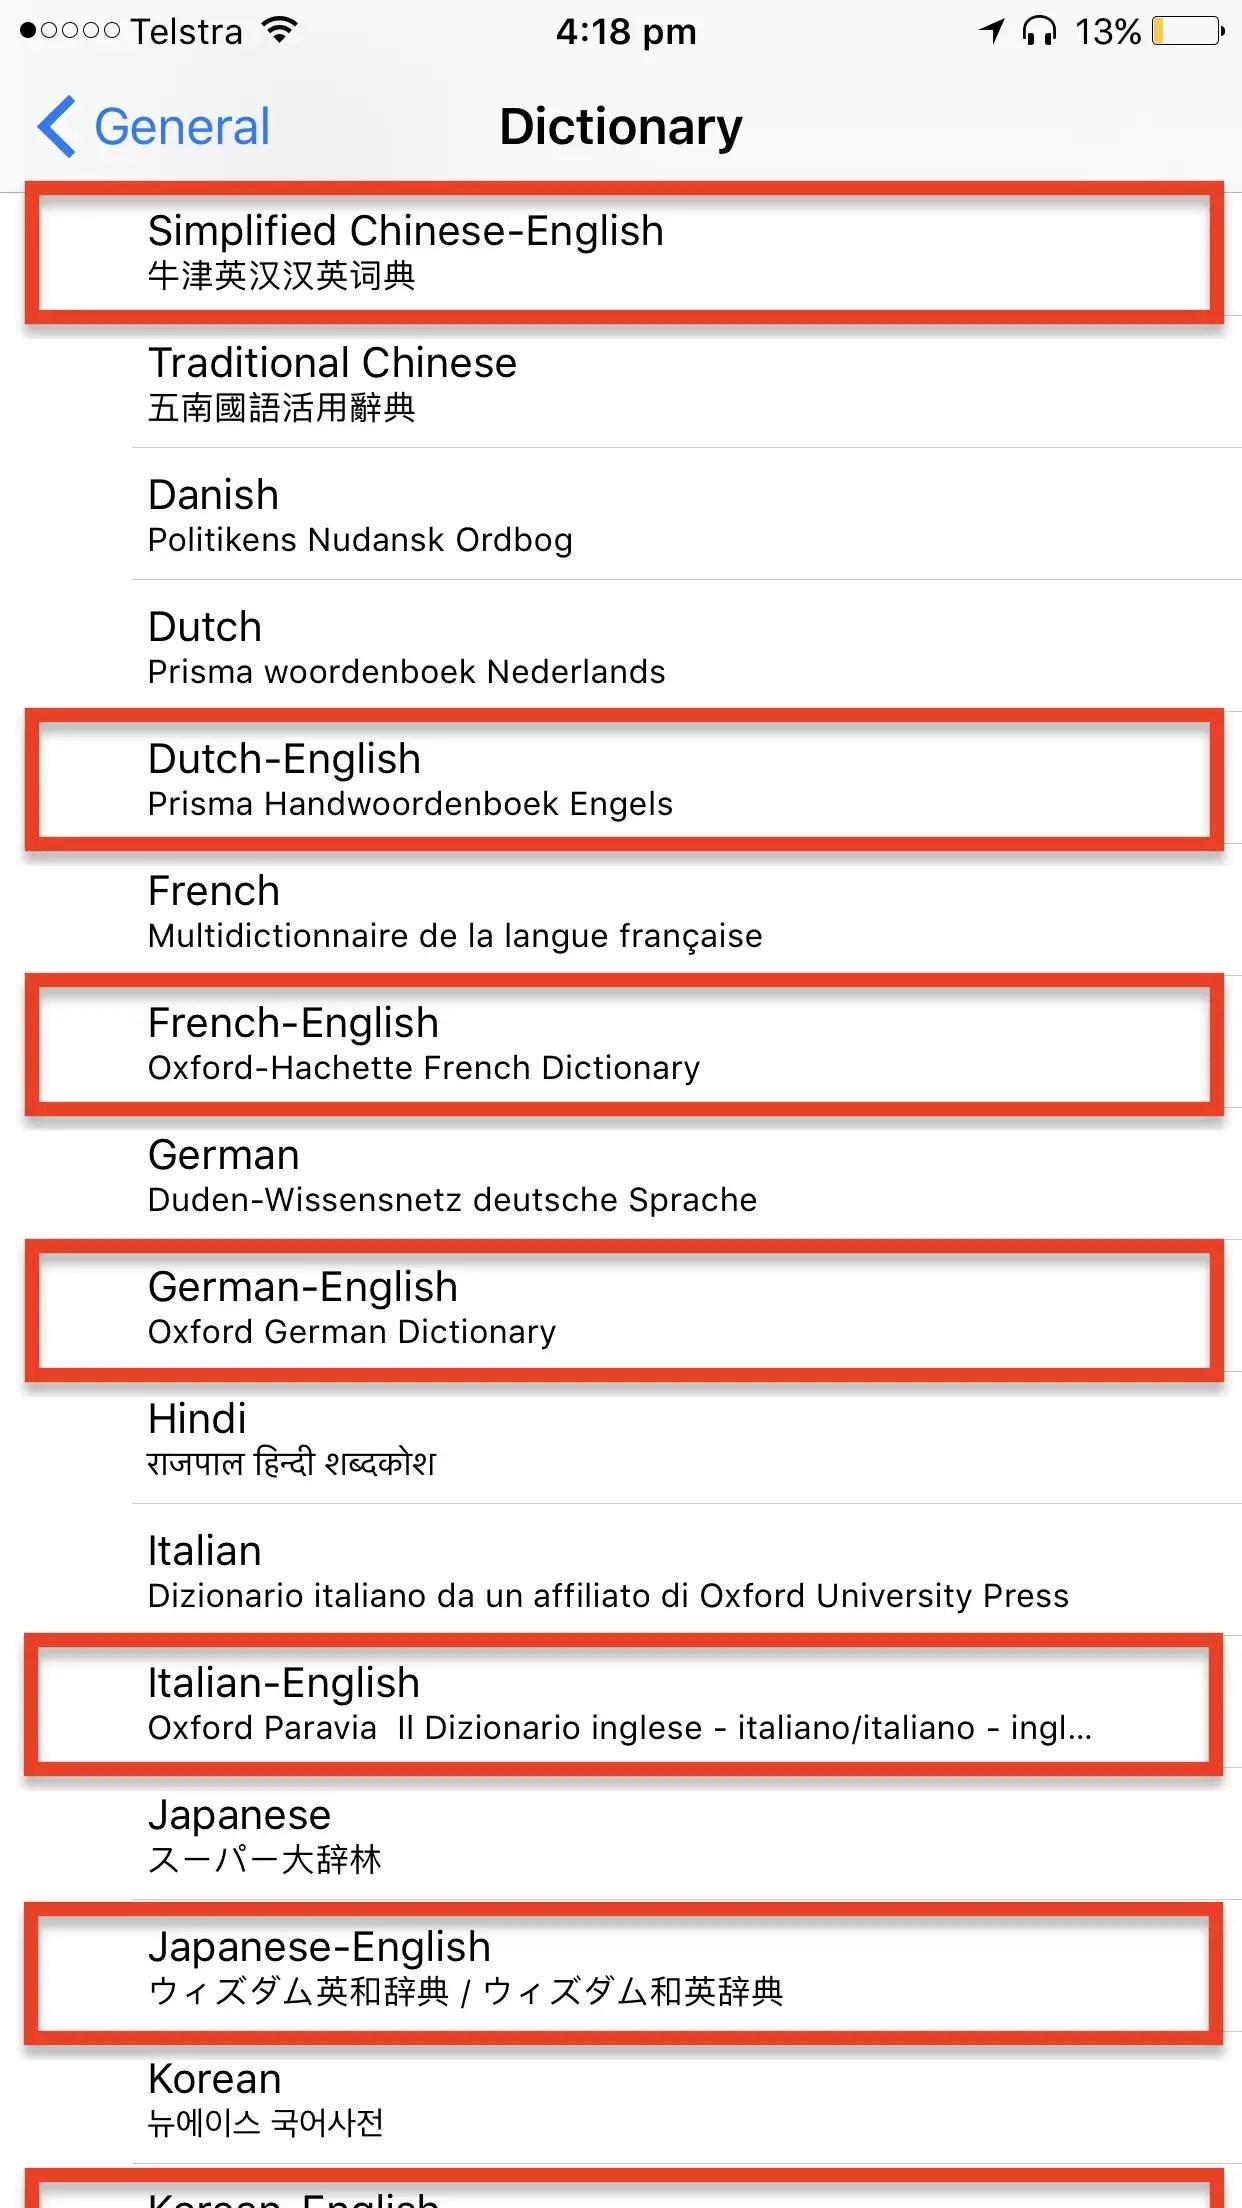 Como Usar Tu Iphone Para Traducir Palabras Extranjeras Al